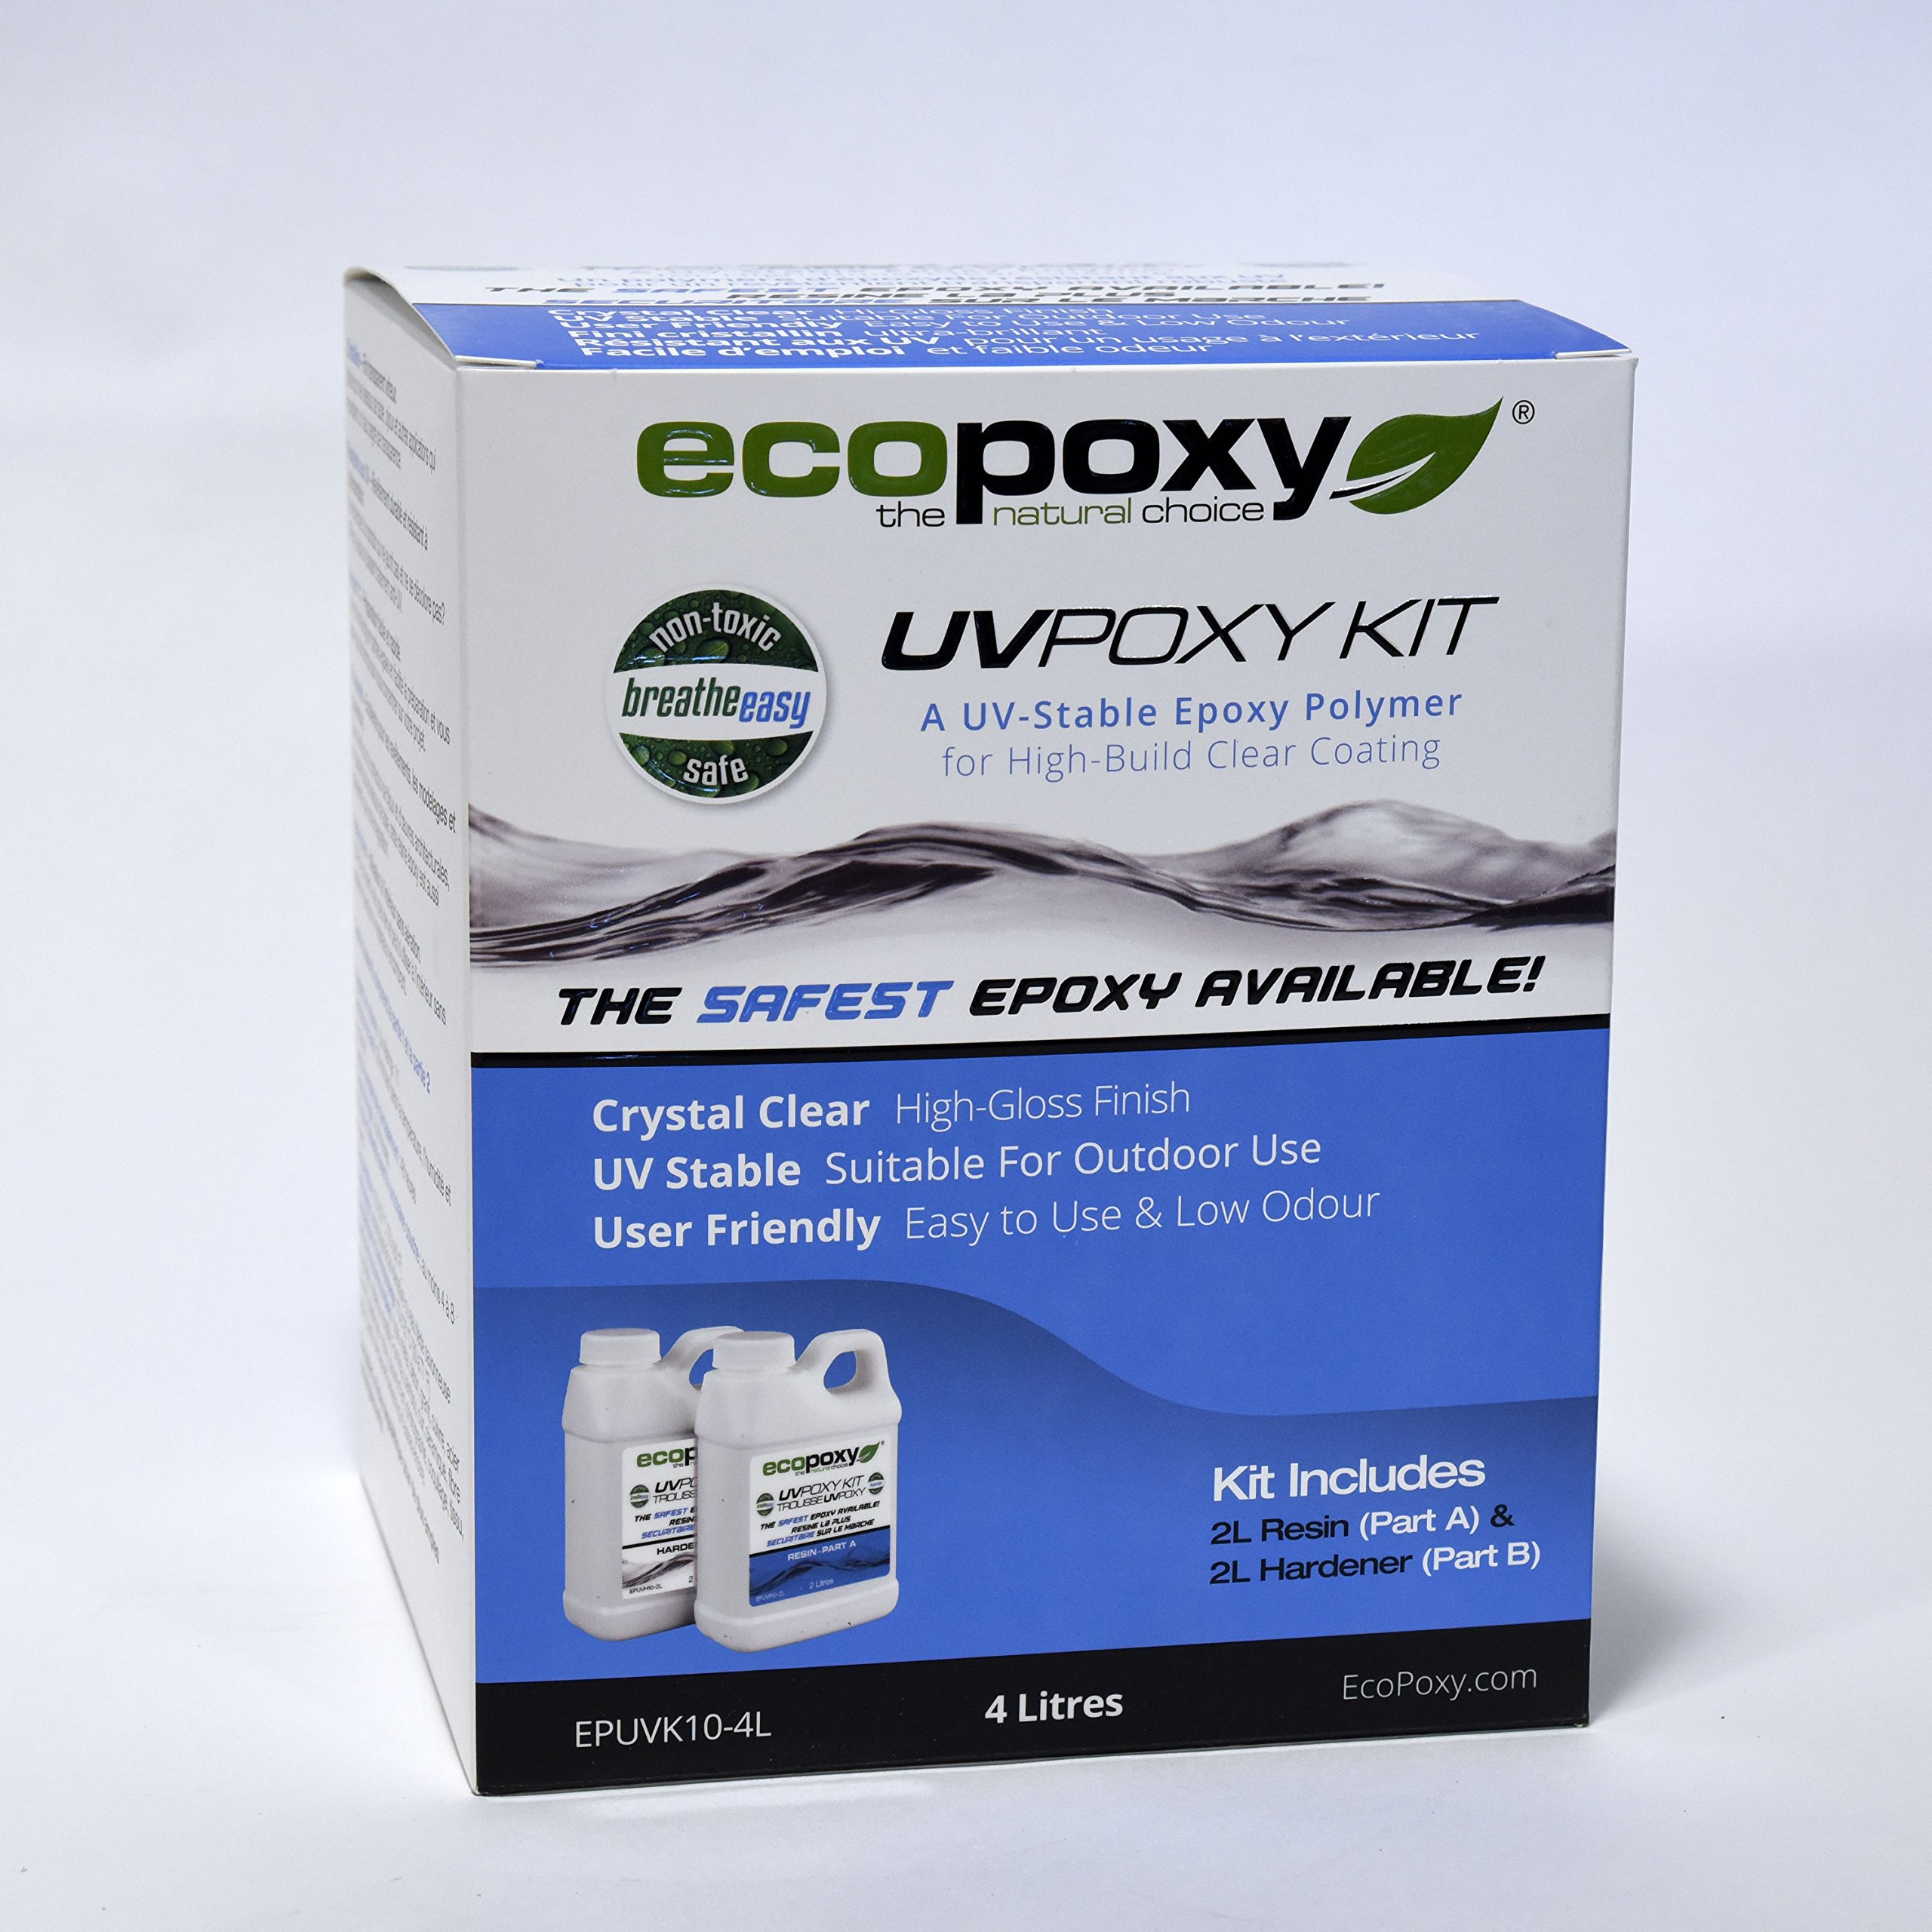 ECOPOXY UVPOXY KITS (4 Litres) by Ecopoxy (Image #1)